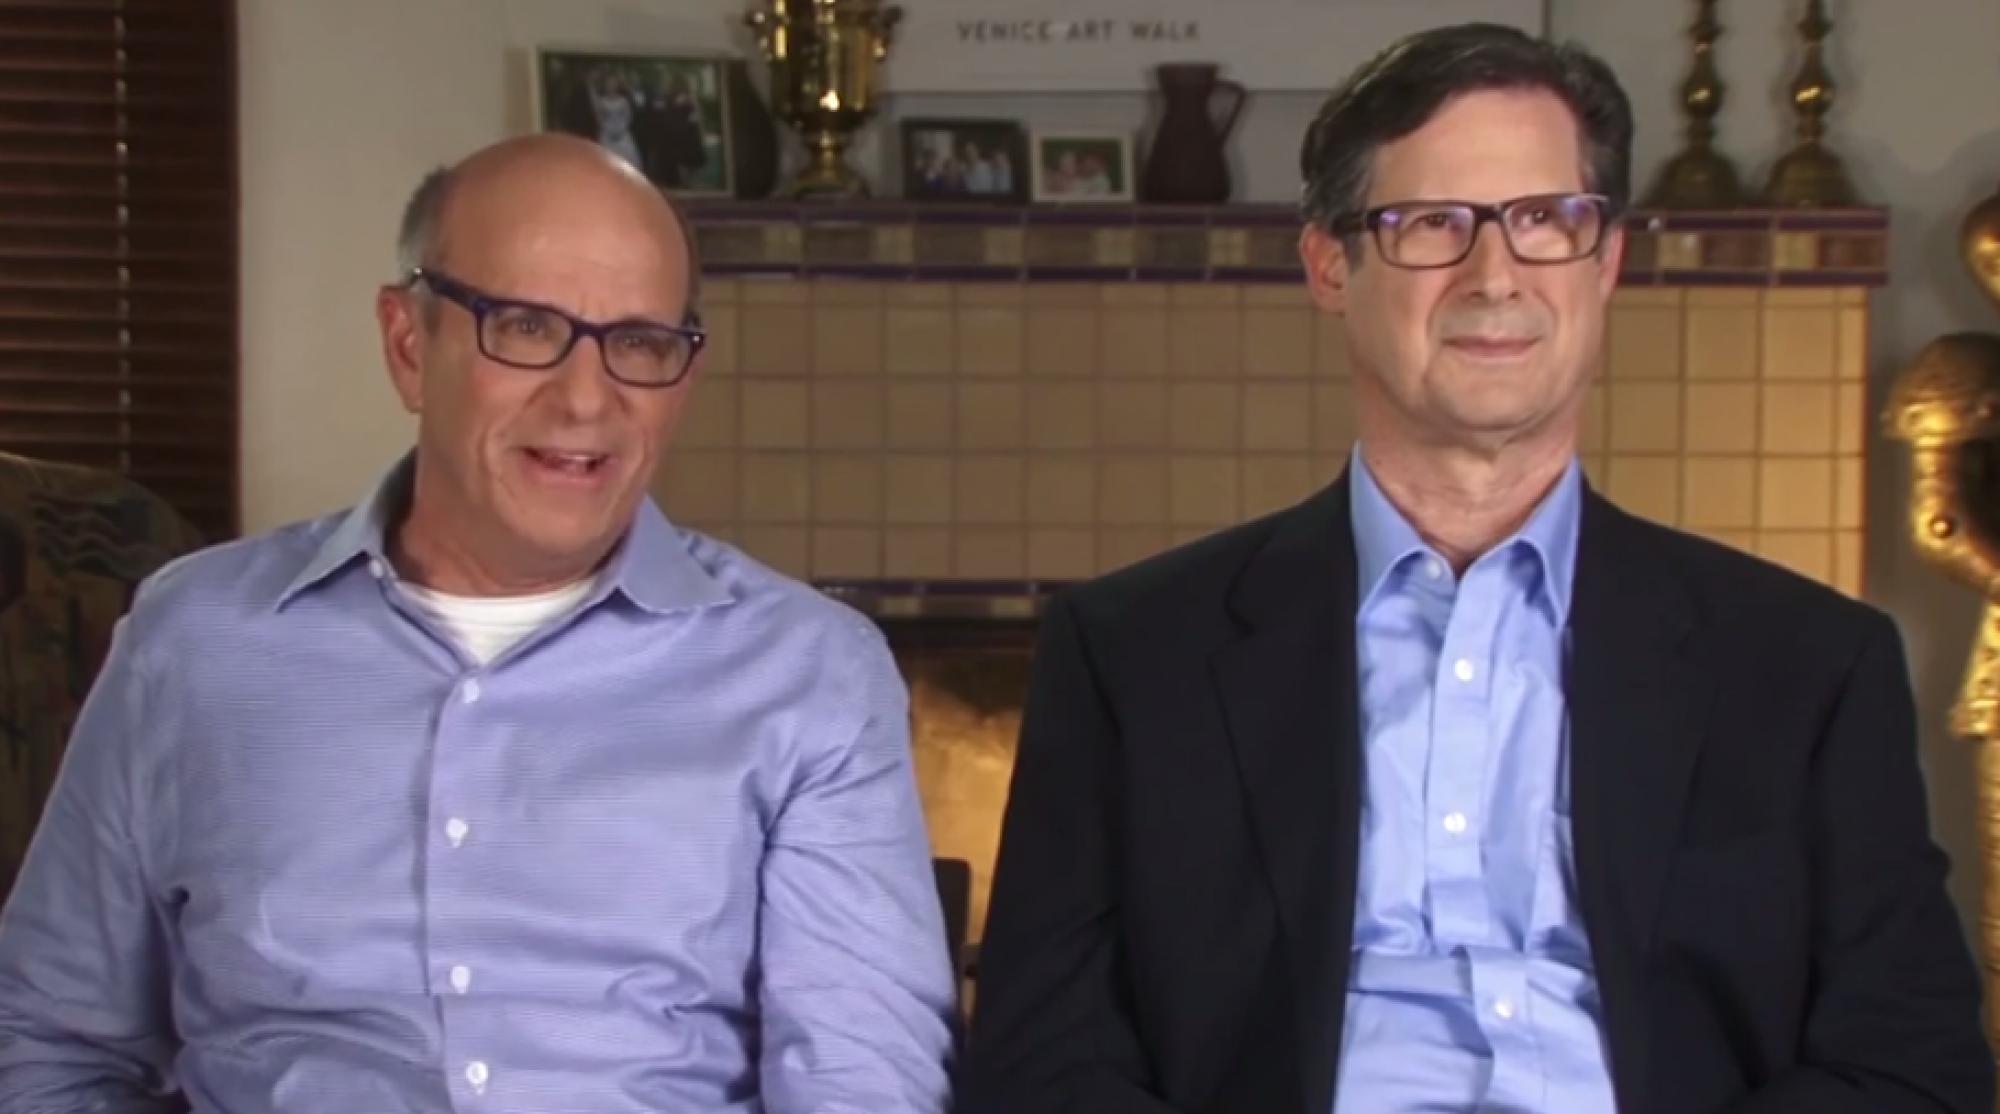 Ken Levine and David Isaacs